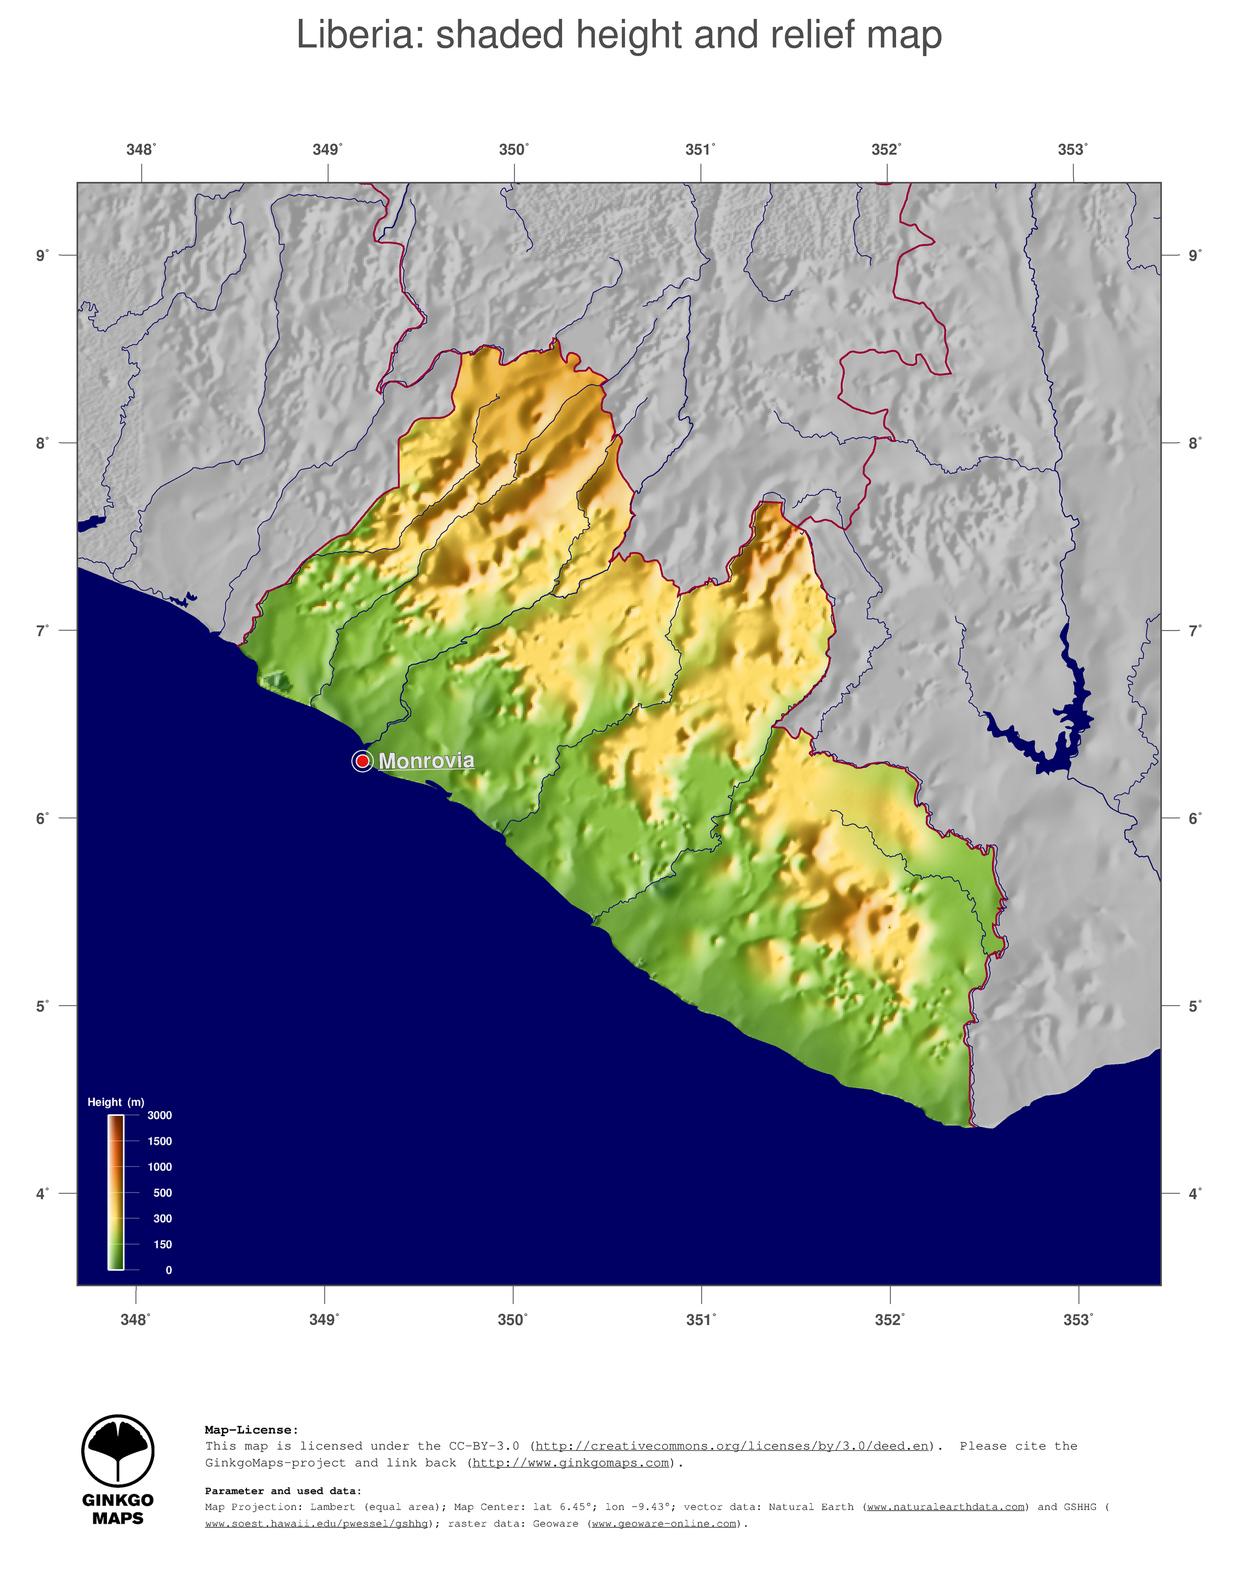 Map Liberia GinkgoMaps Continent Africa Region Liberia - Liberia map